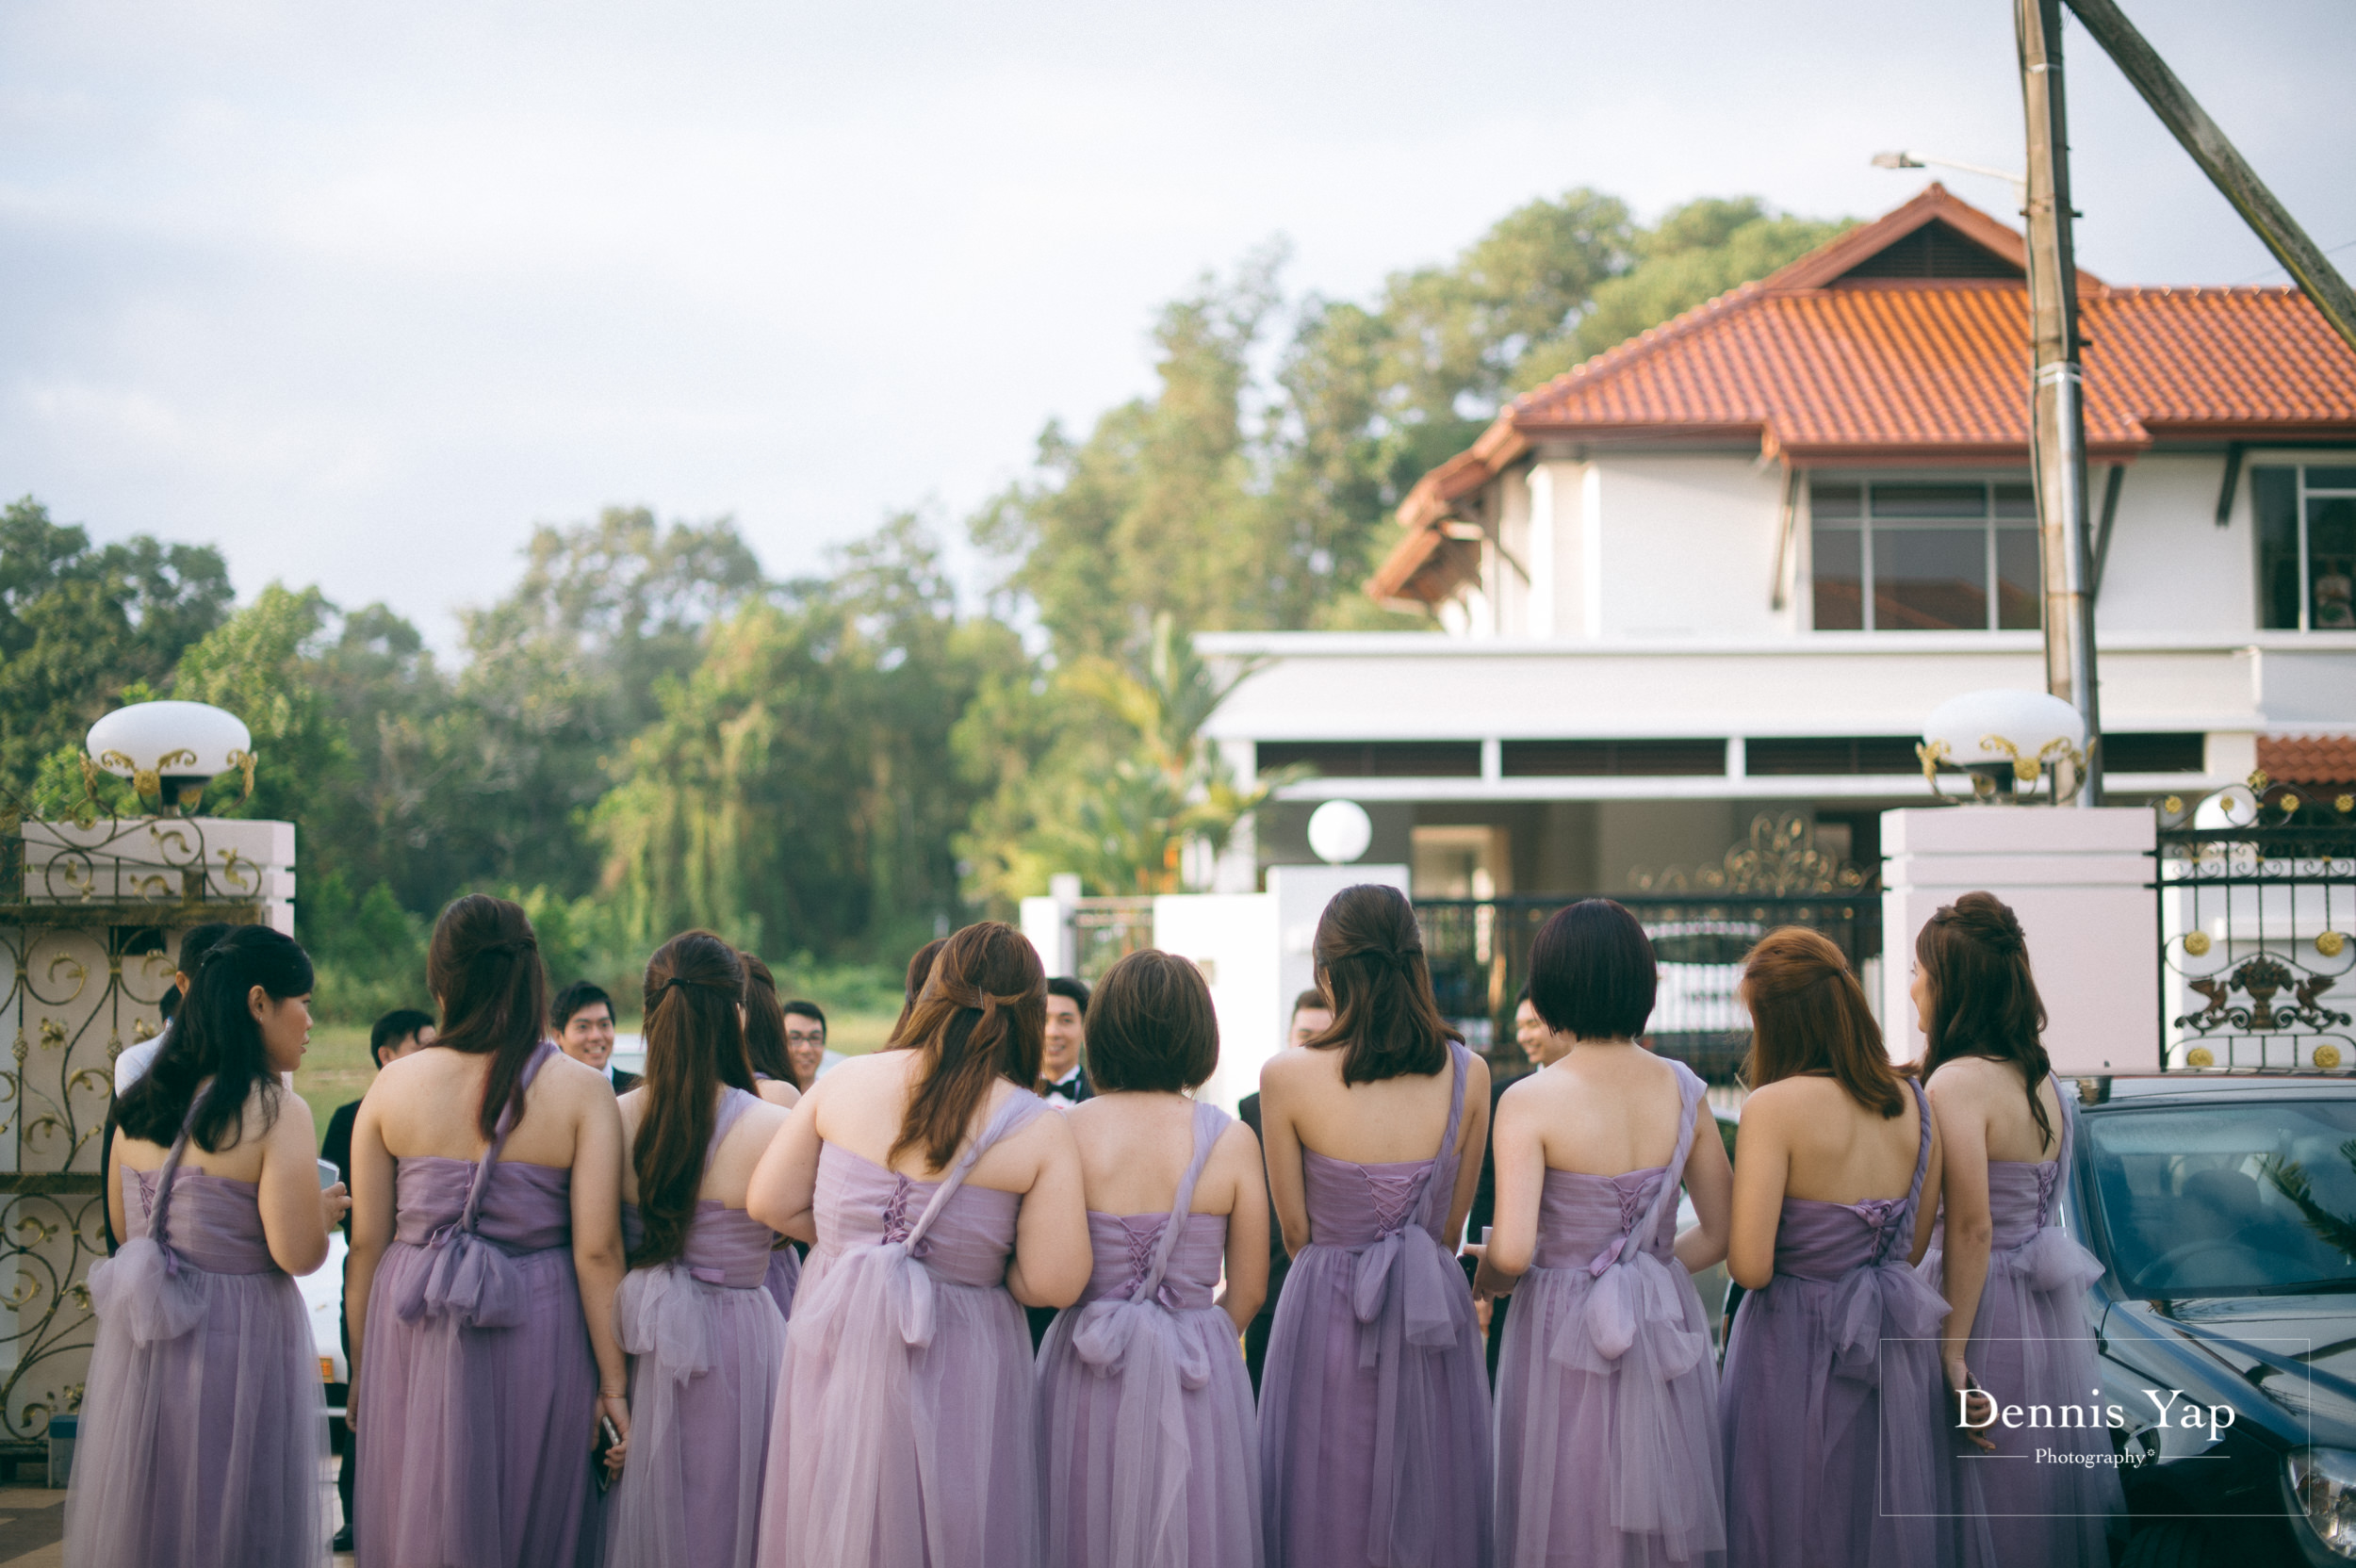 jonathan christabelle wedding church kota kinabalu dennis yap photography malaysia -6.jpg